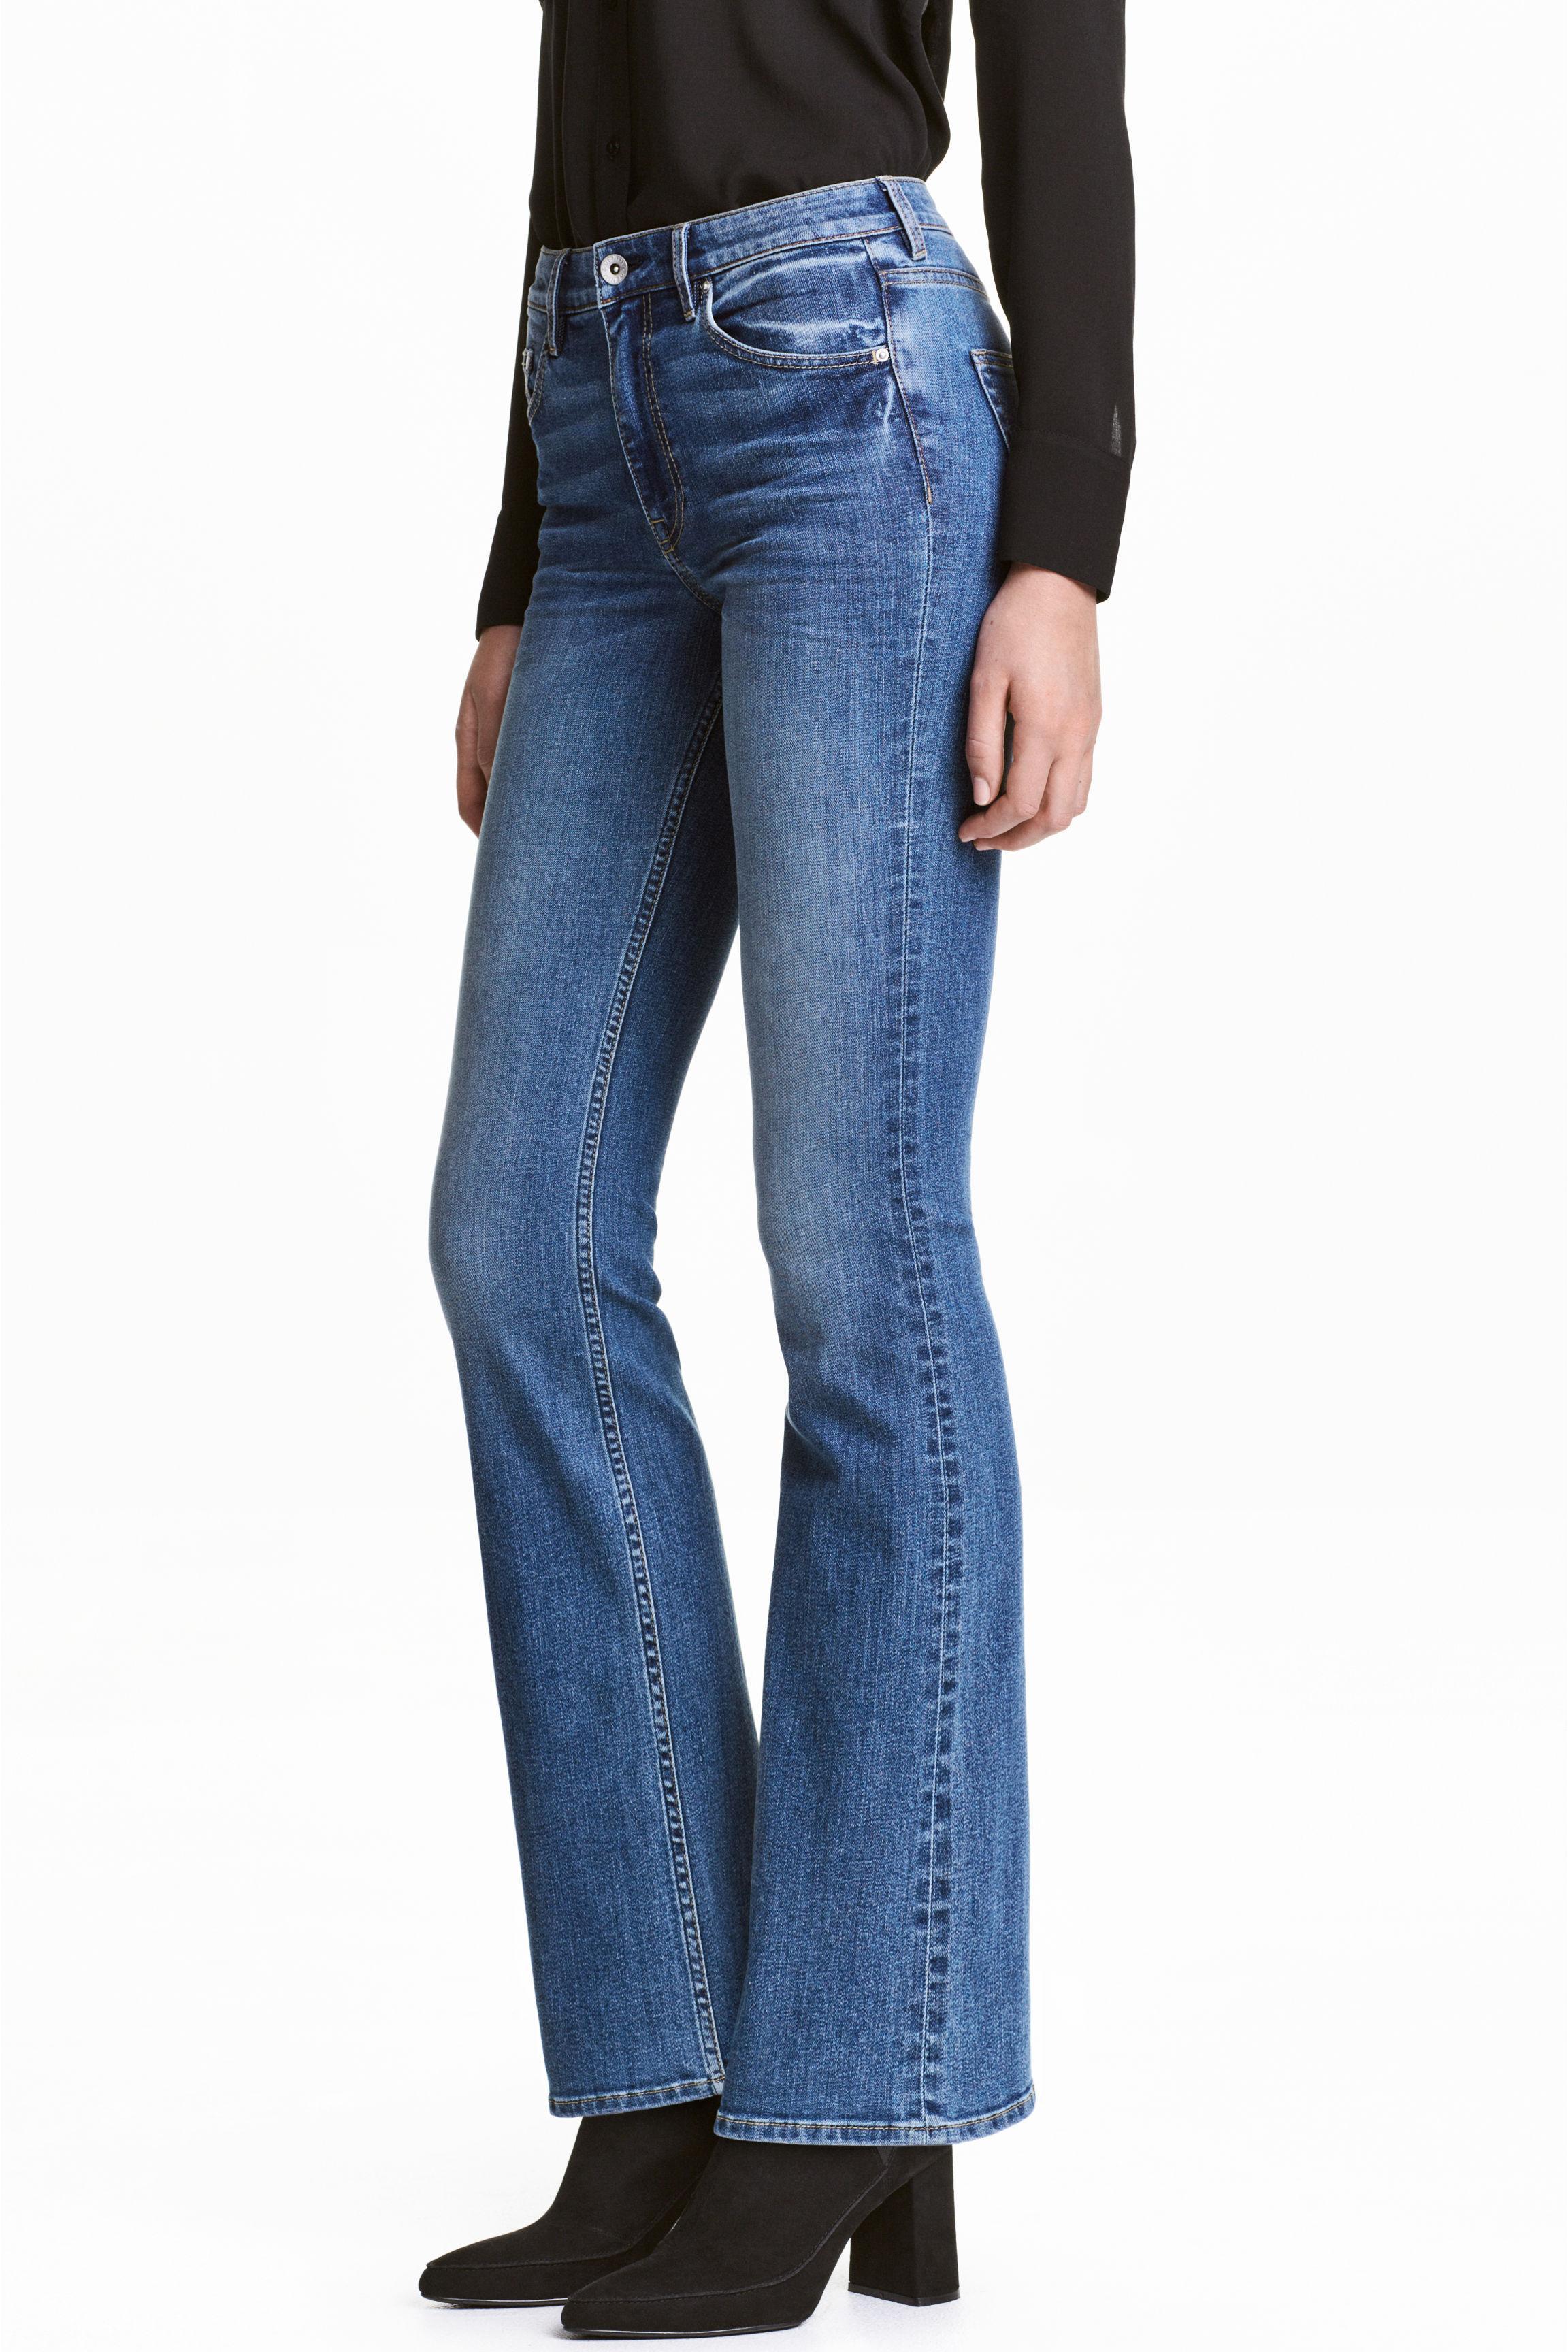 h m boot cut regular jeans in blue lyst. Black Bedroom Furniture Sets. Home Design Ideas